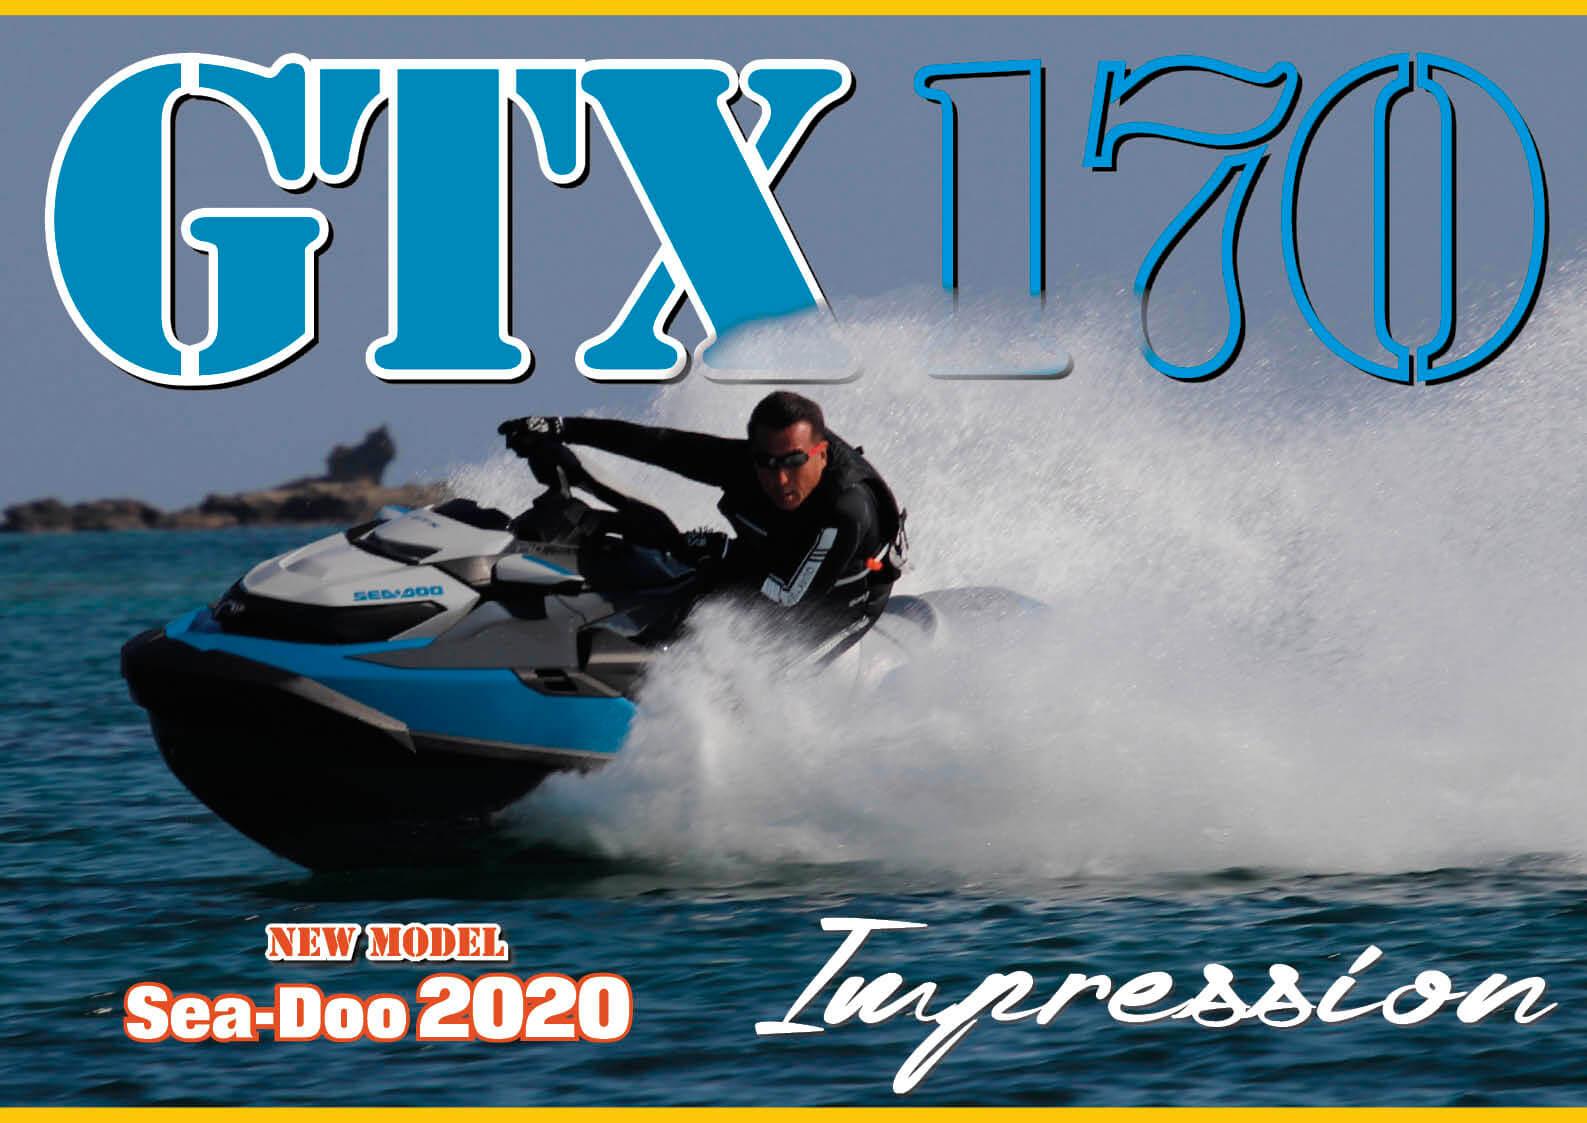 2020 SEA-DOO(シードゥ)「GTX 170」試乗インプレッション  ジェットスキー(水上バイク)